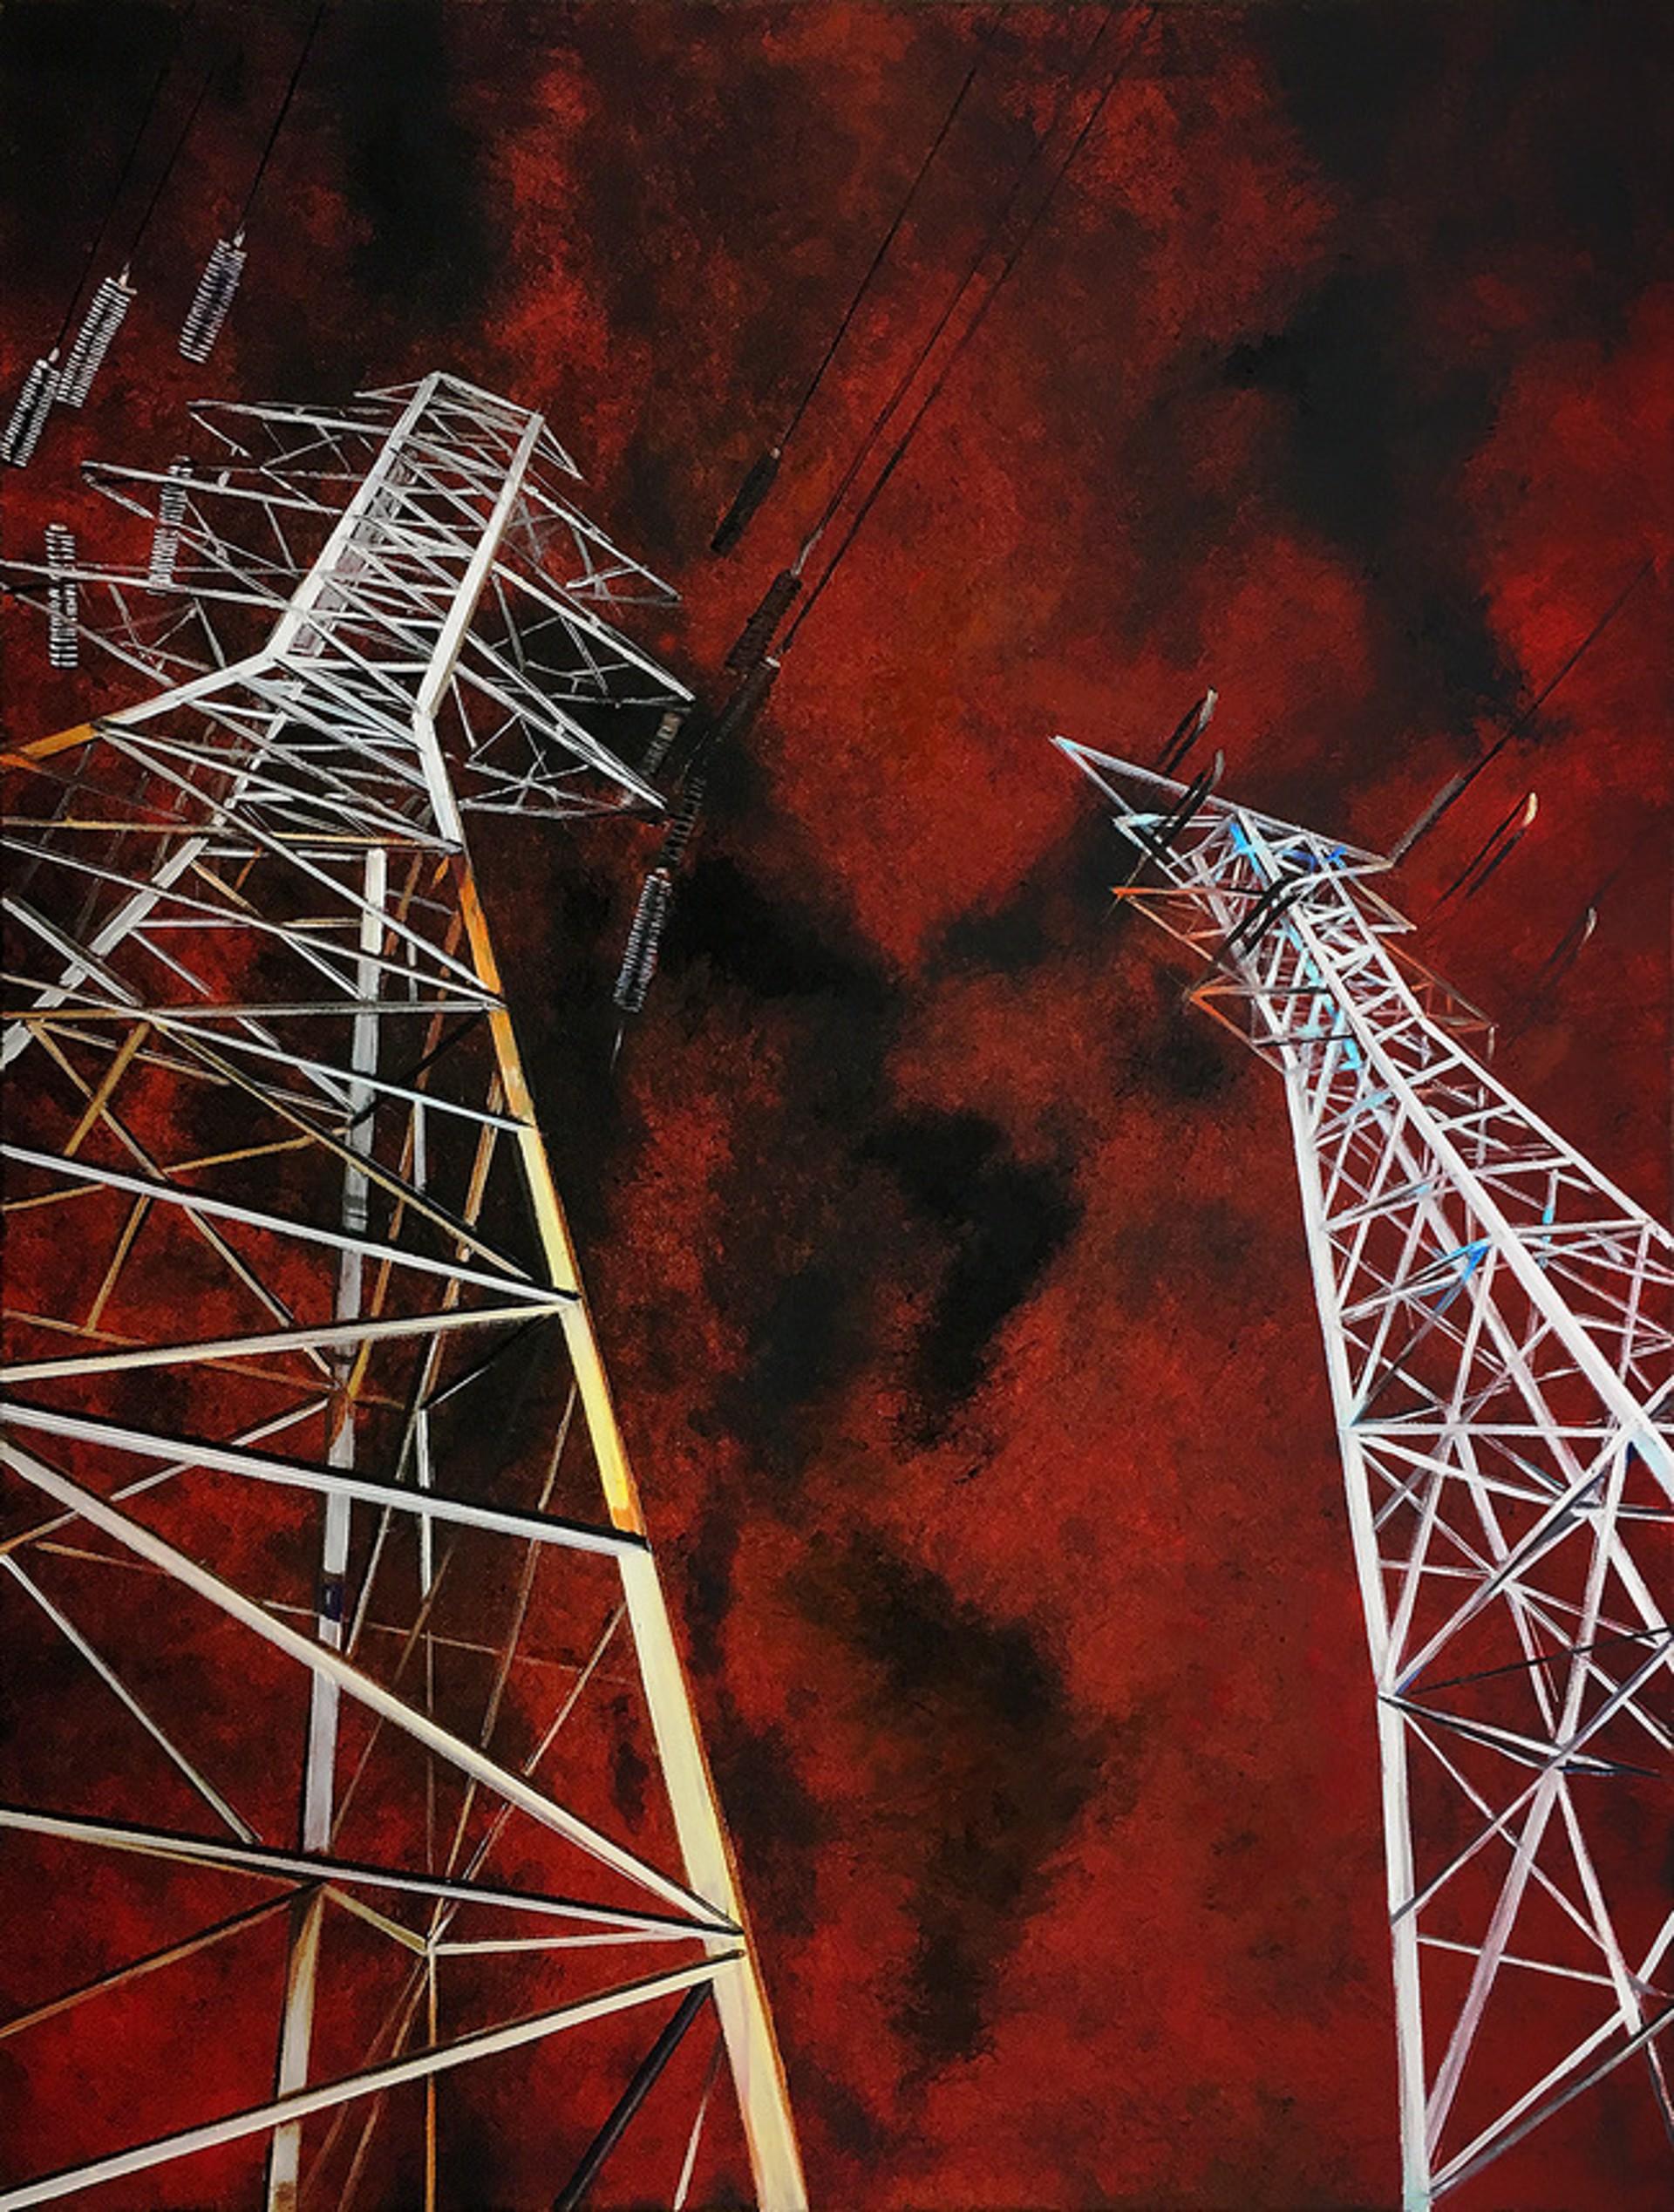 Towers on a Menacing Sky by Allan Gorman